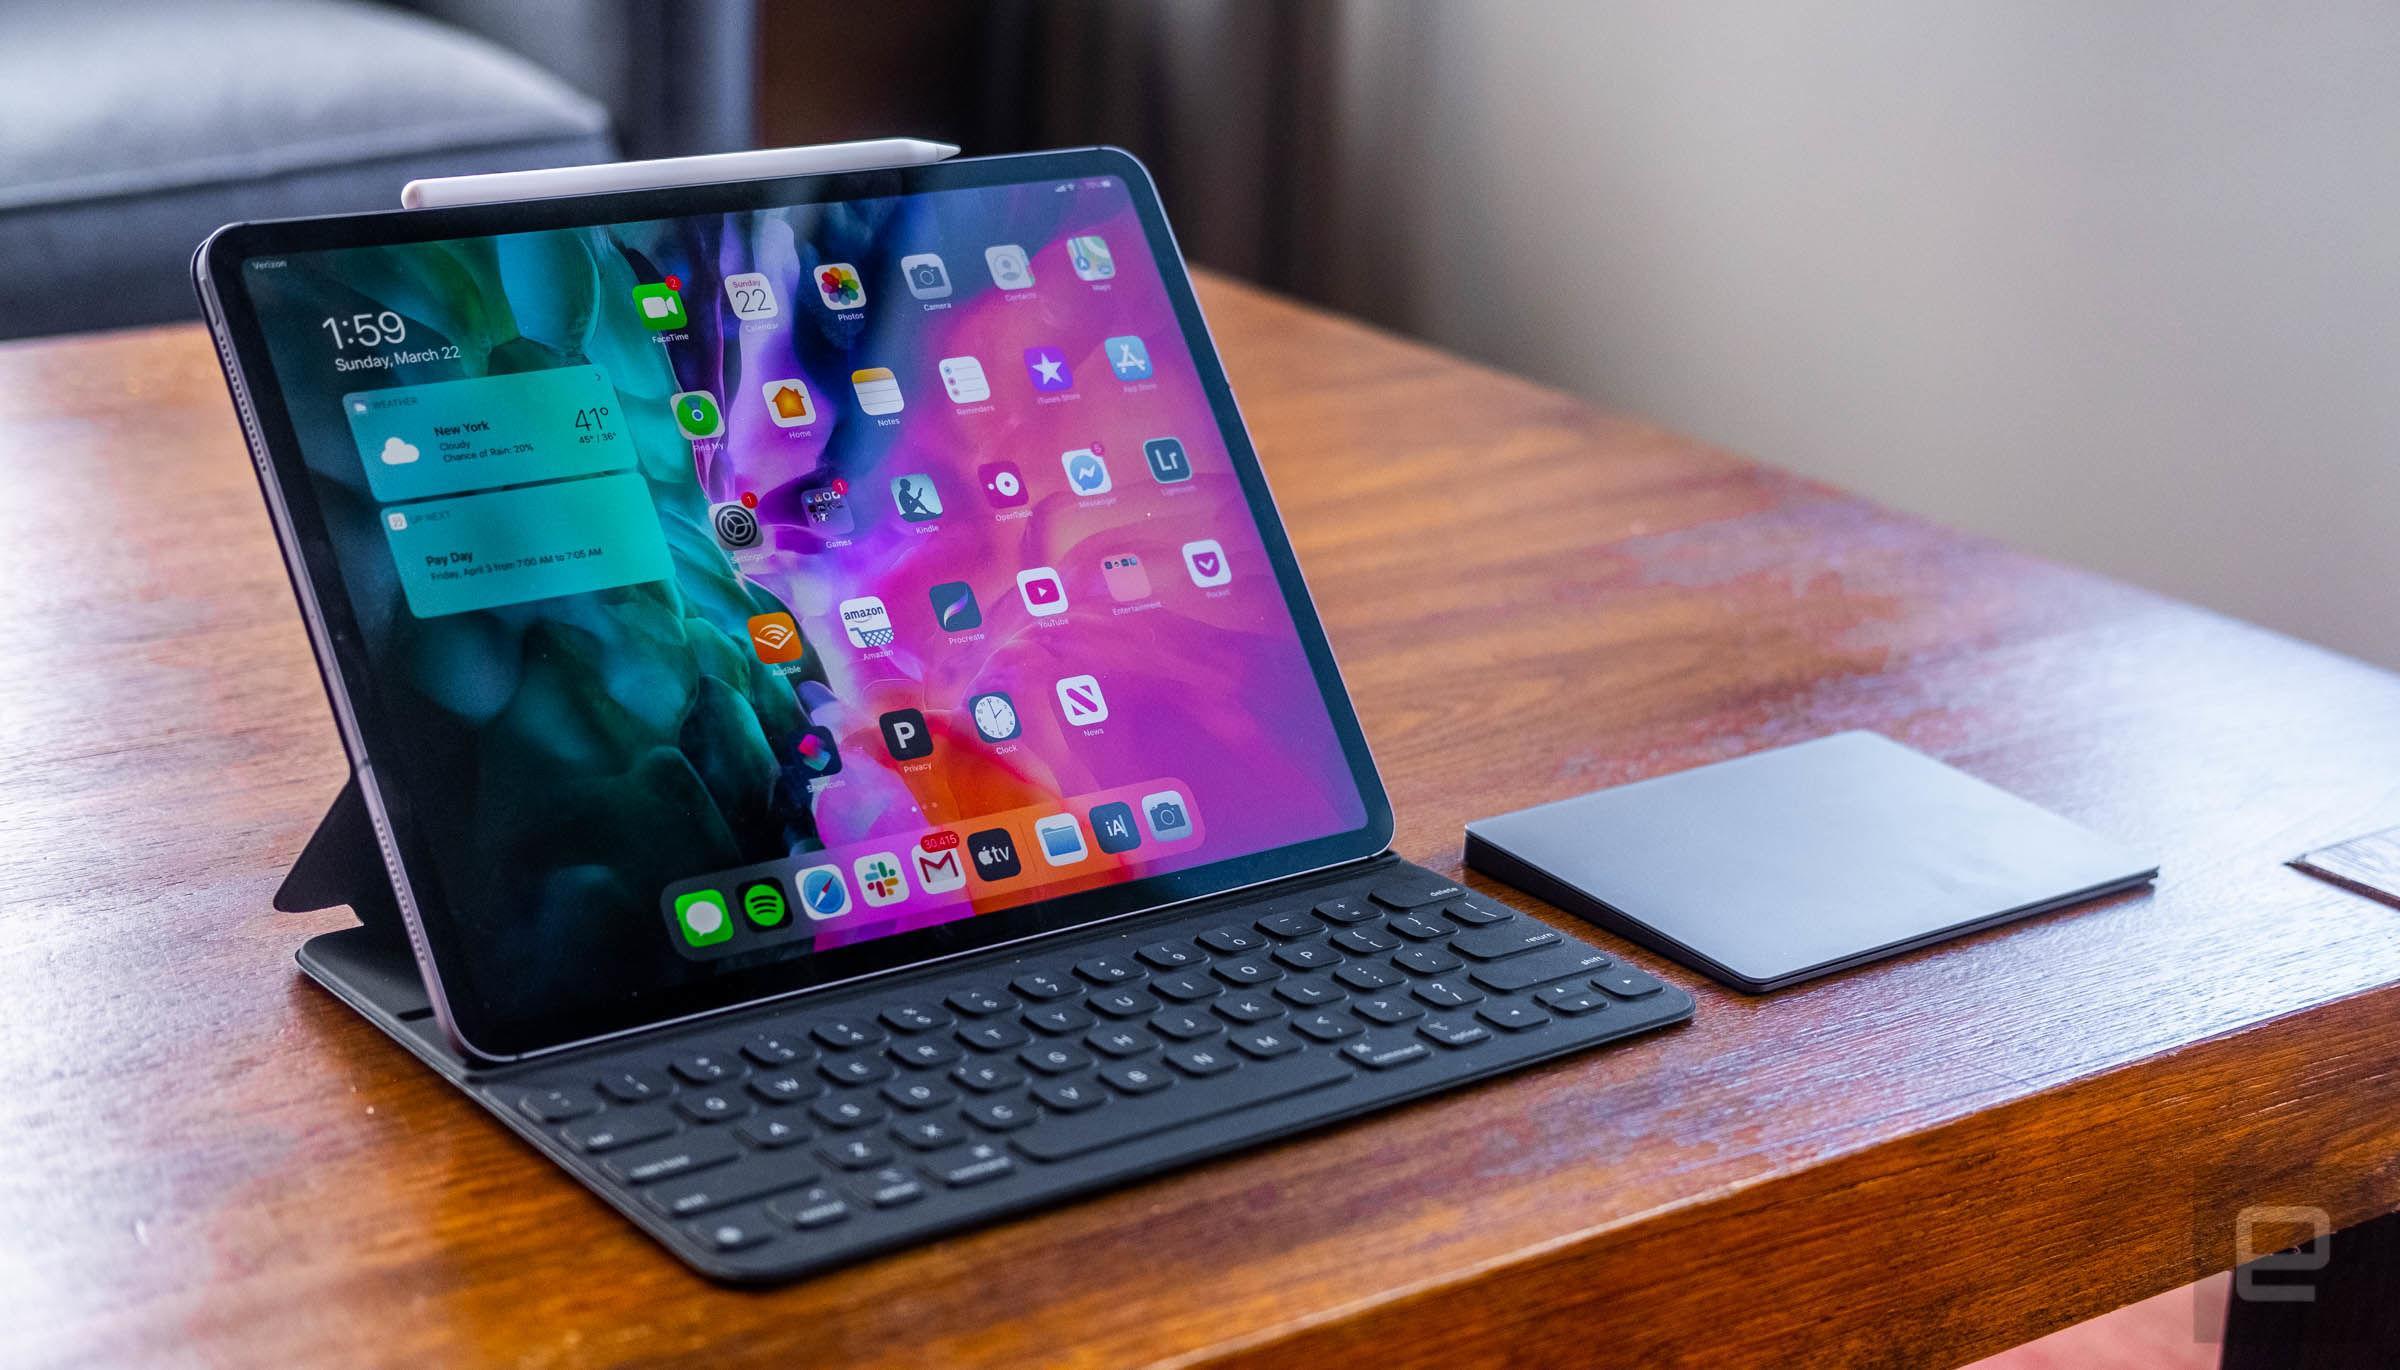 Guide on iPad Pro 2021, Apple iPad Pro 12.9 - Read In Brief